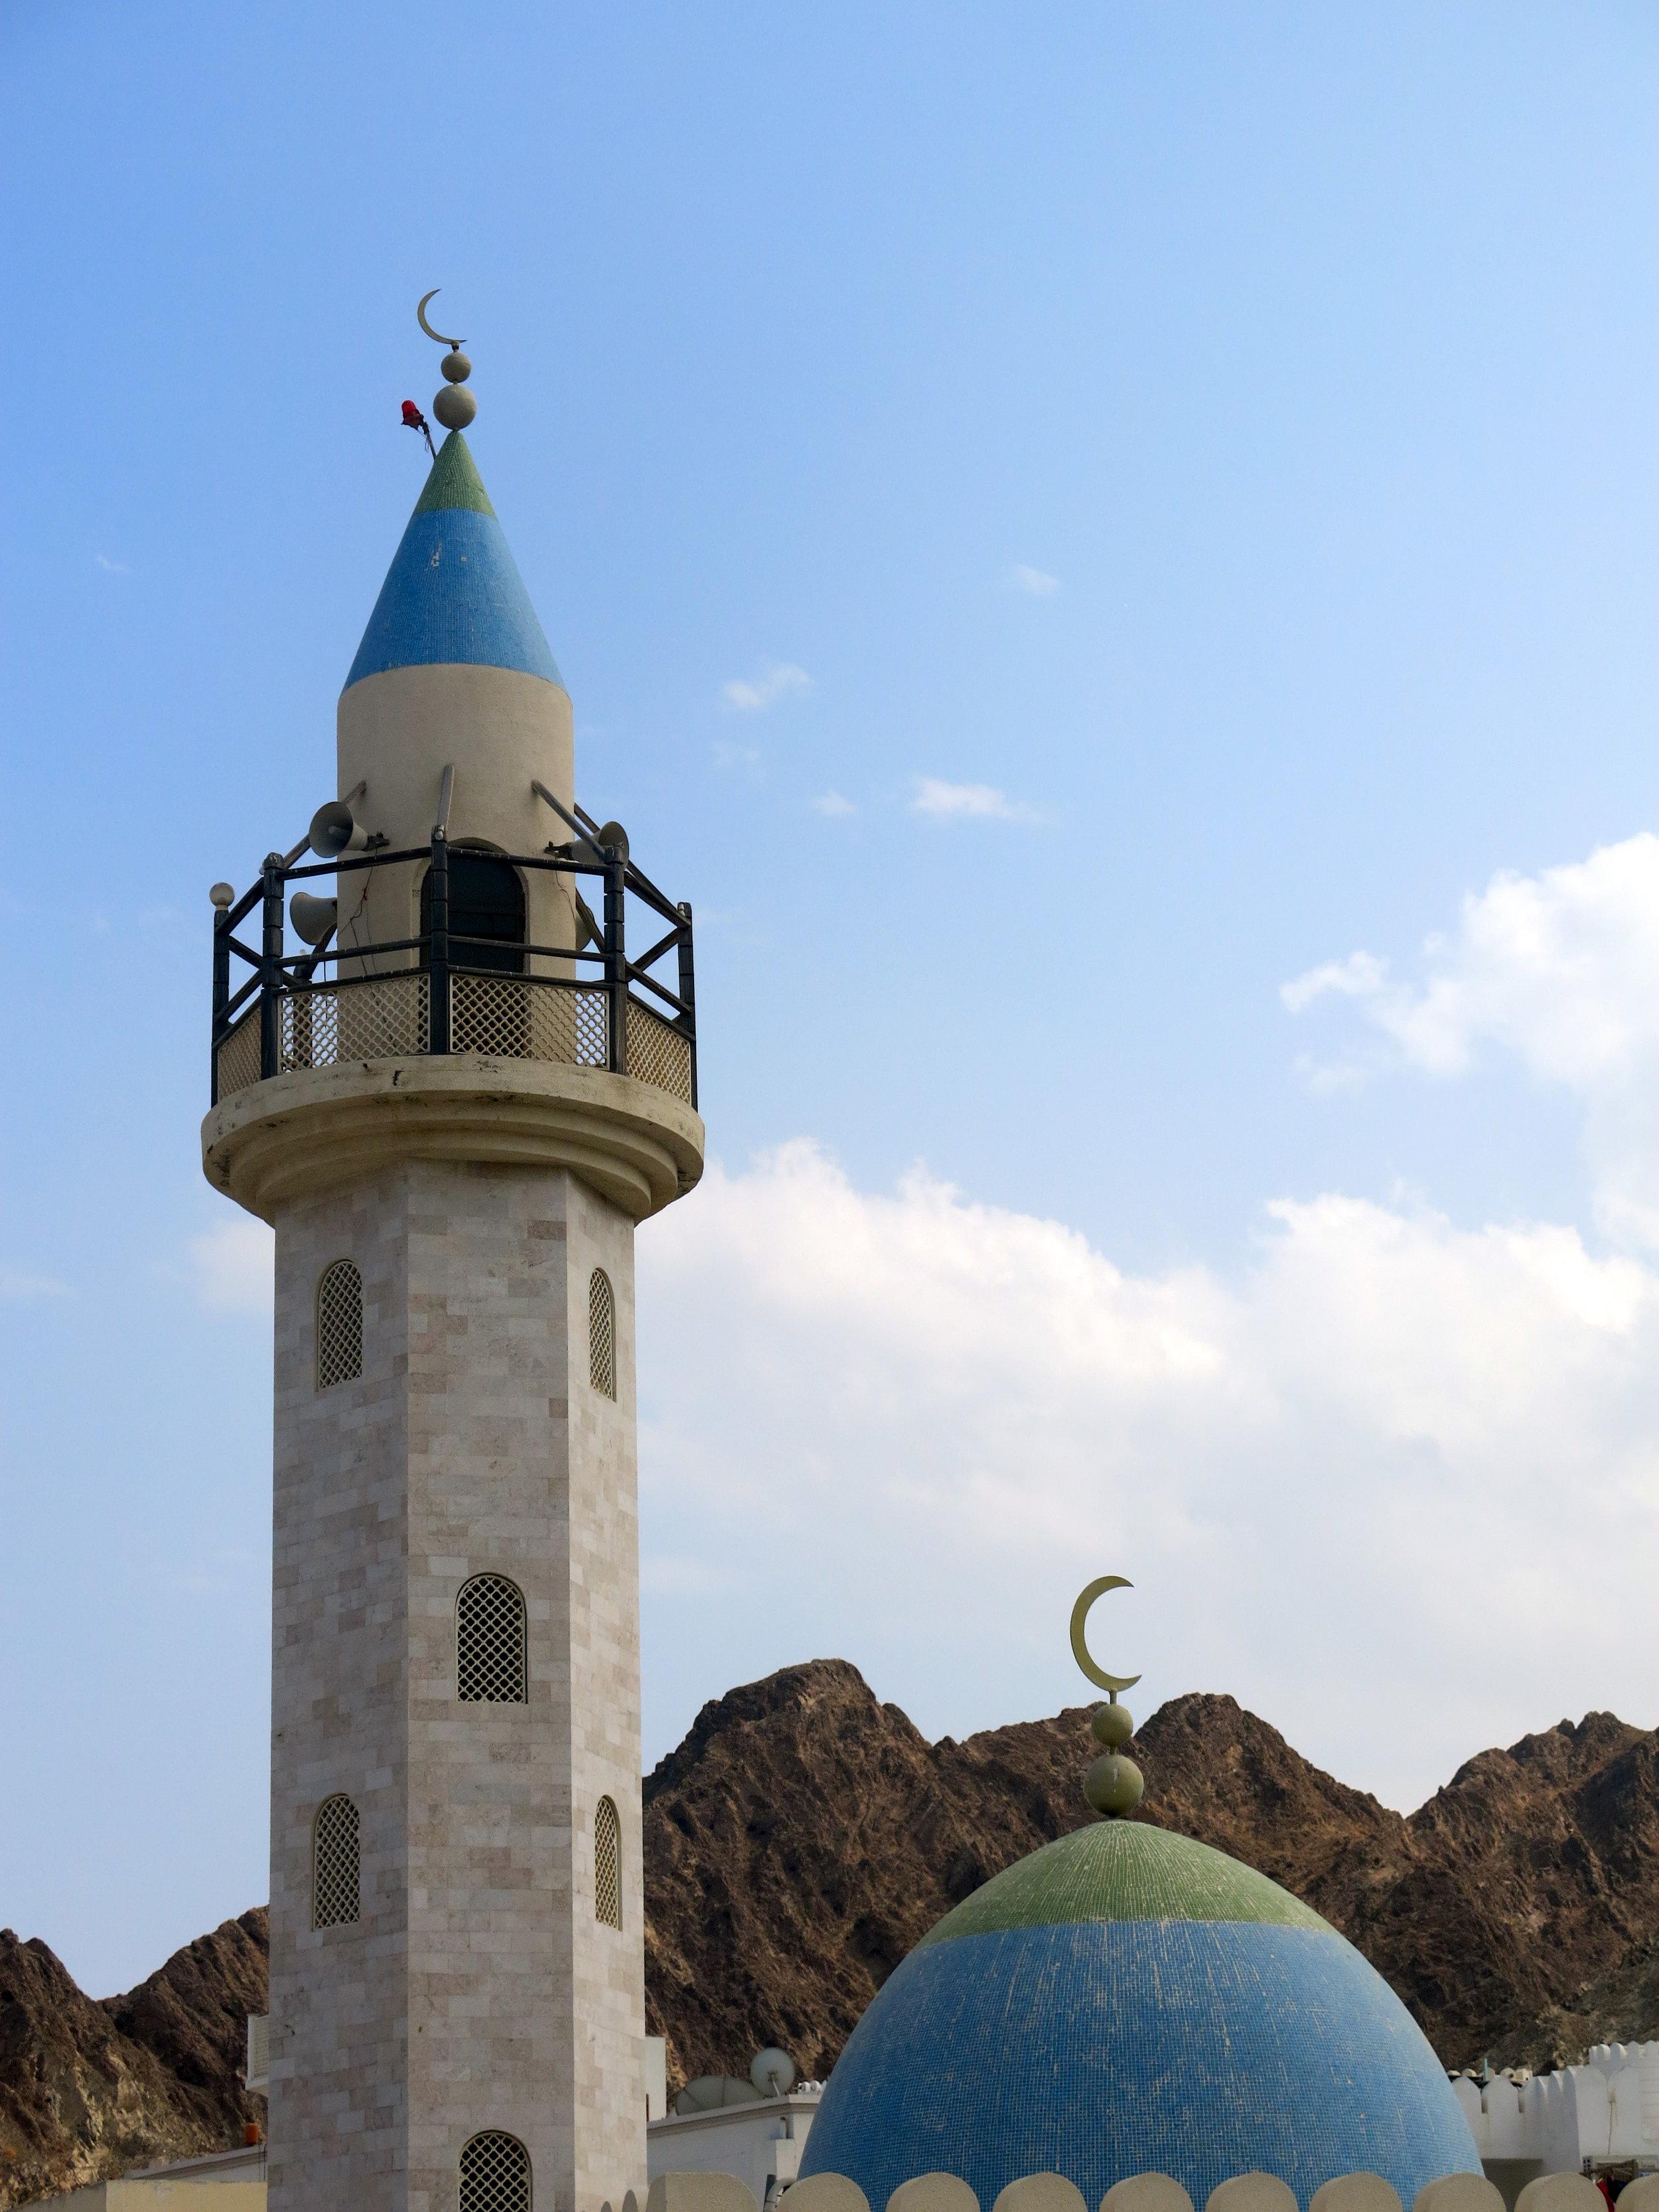 The minaret of a mosque near the Muttrah corniche